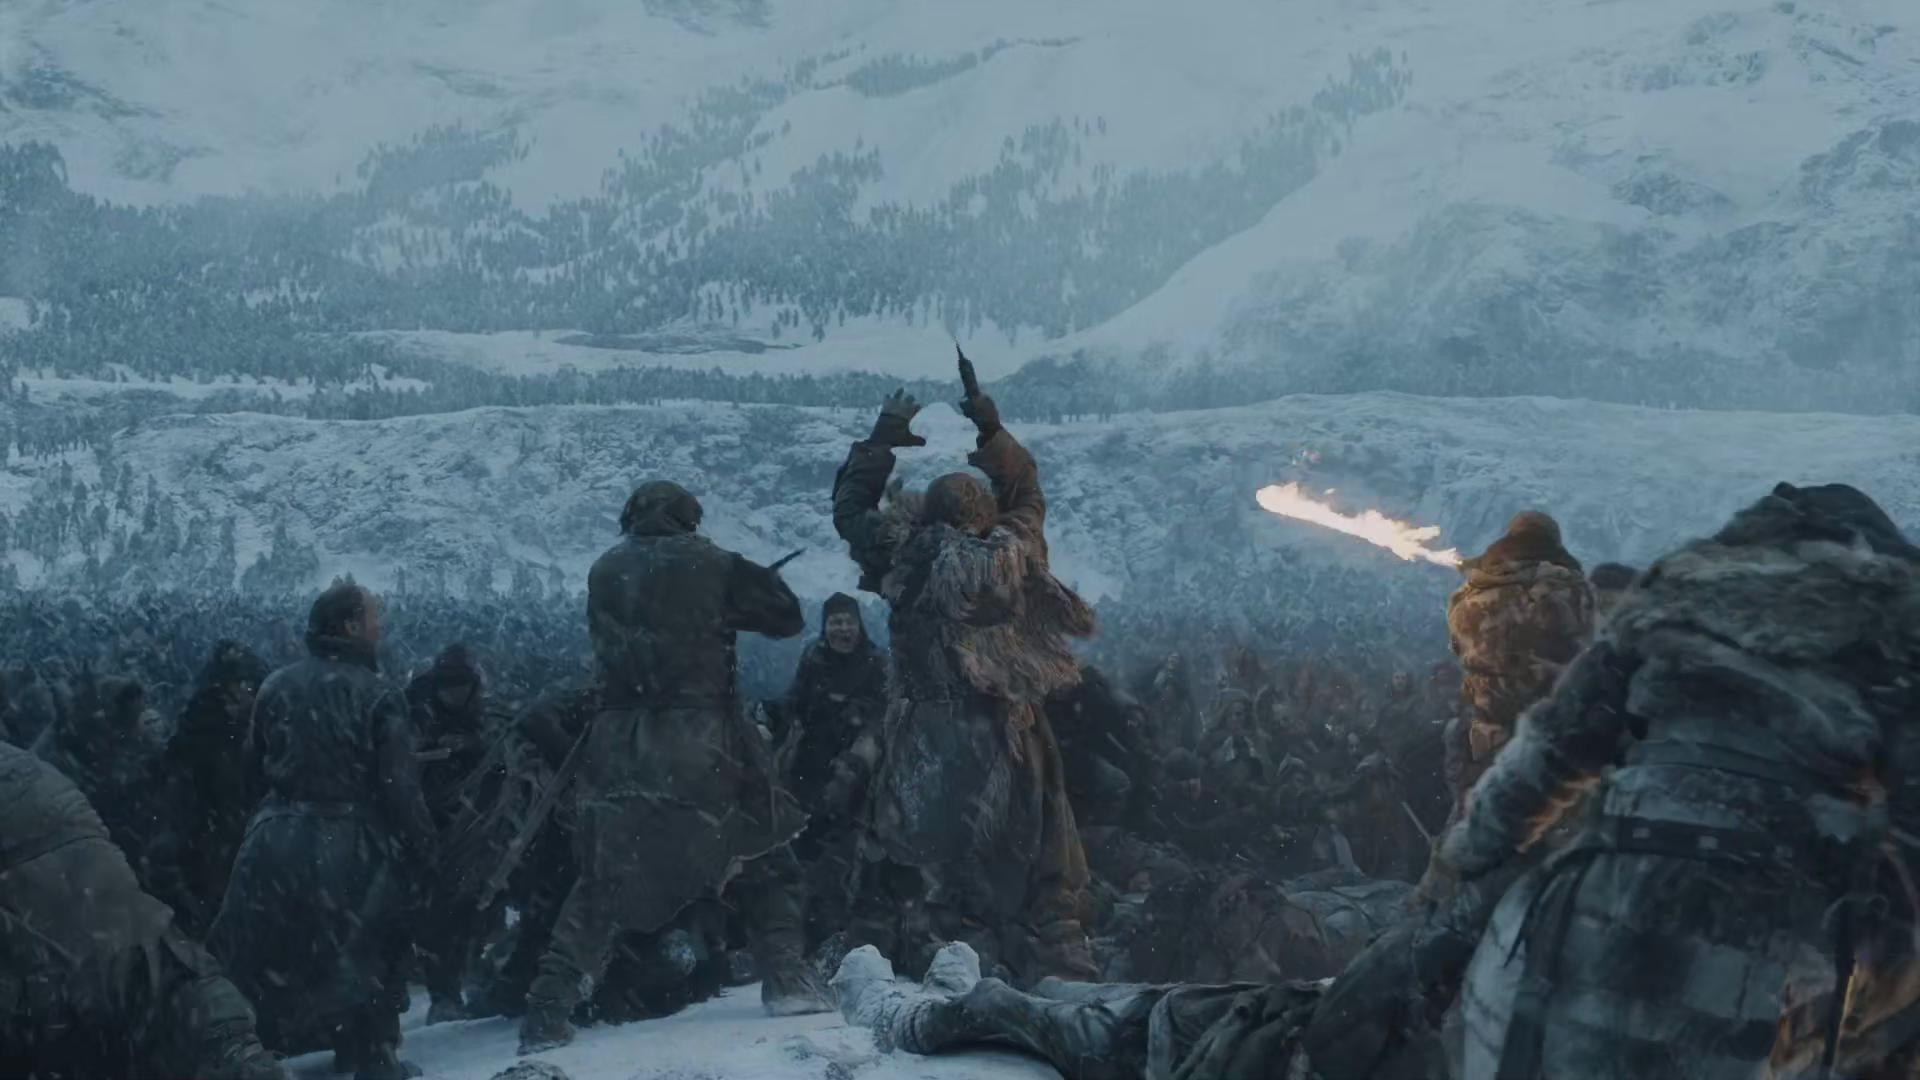 Game of Thrones landscape war